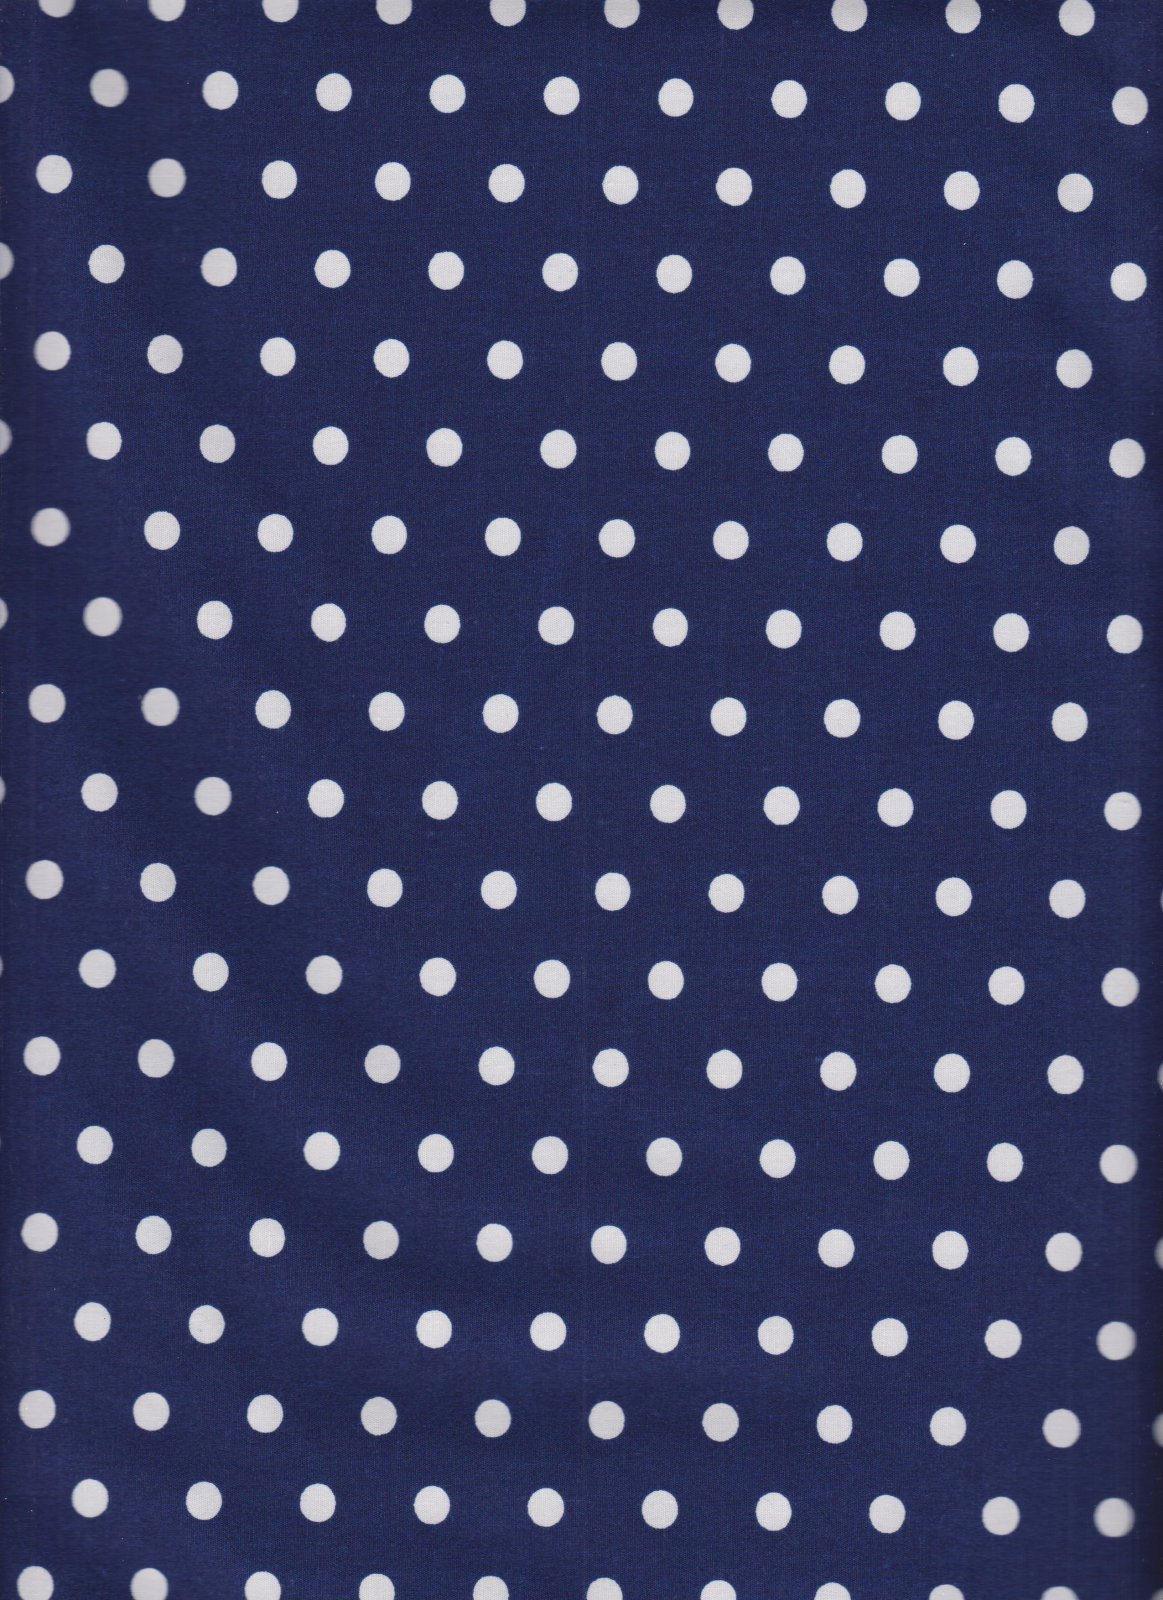 White Dots on Navy Background